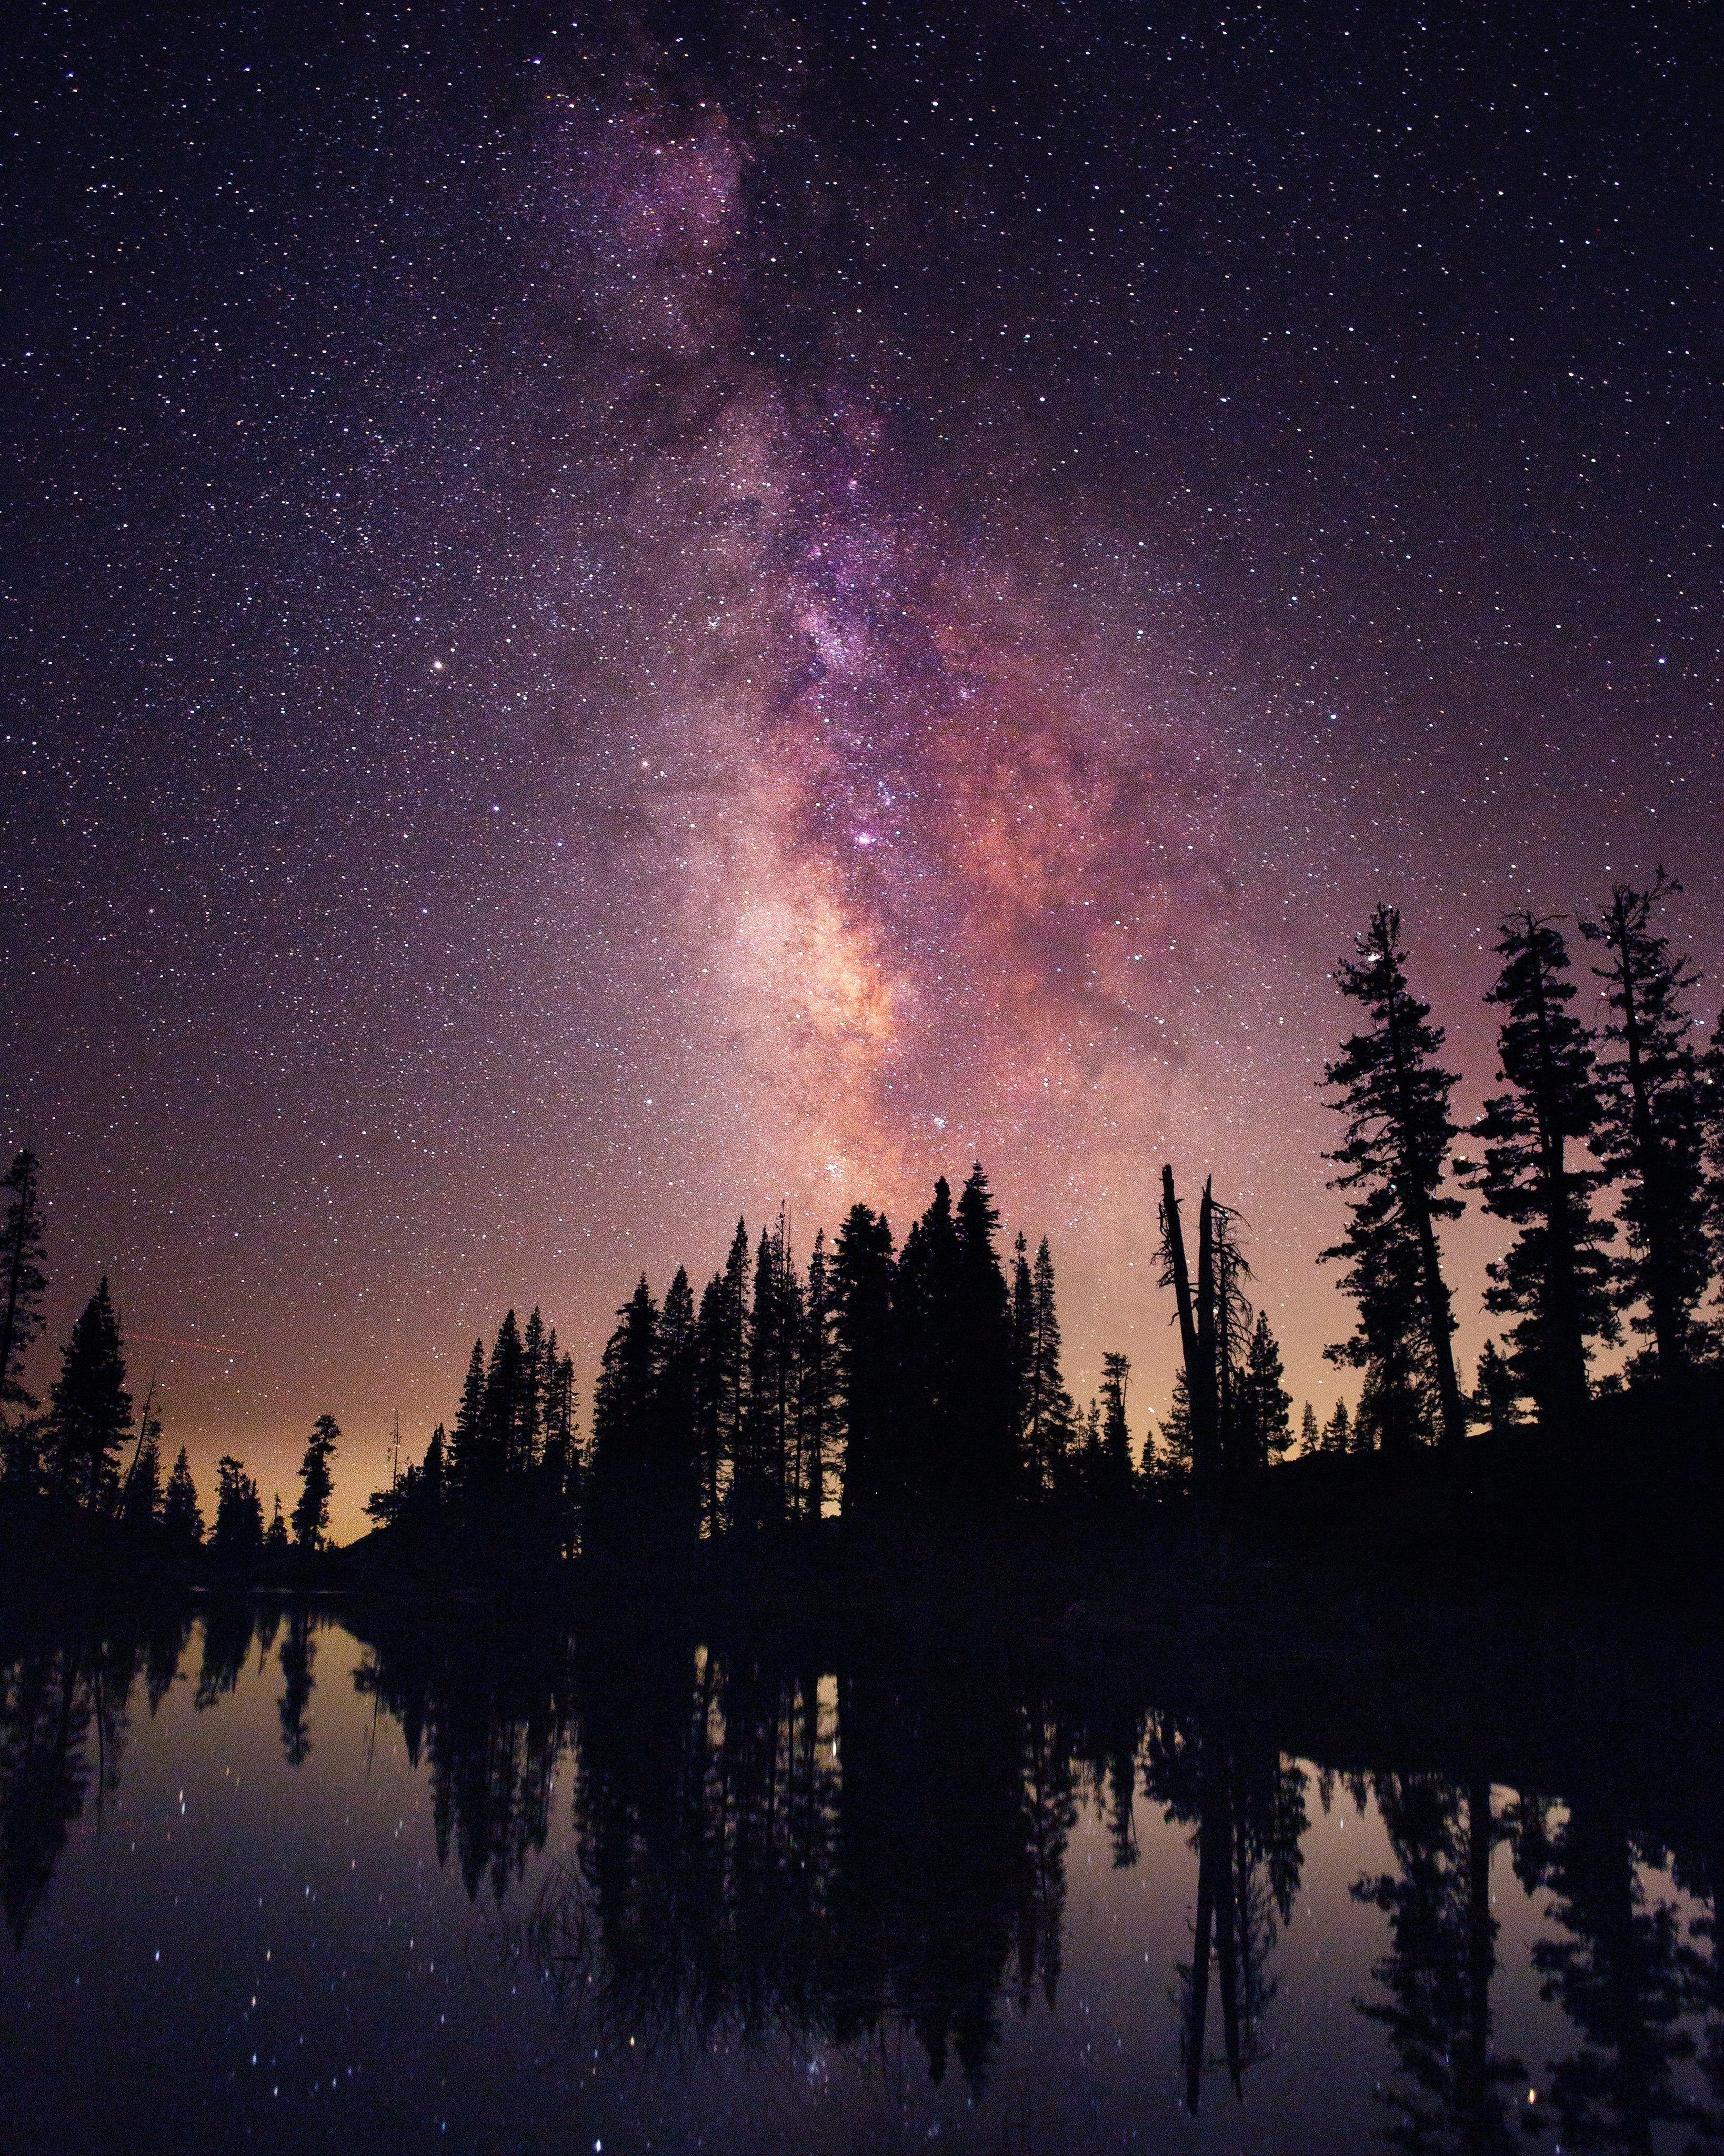 Starry Sky Over Lake Tahoe California Night Sky Photography Night Sky Wallpaper Sky Aesthetic Wallpaper night starry sky lake trees